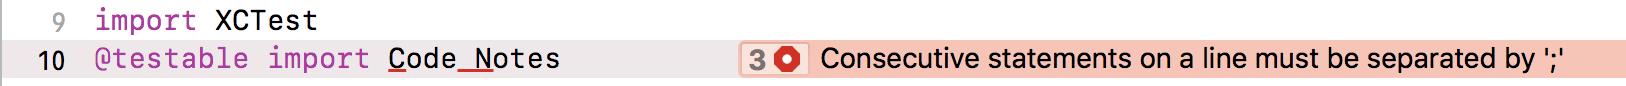 Screenshot of Xcode 4 10 18 12 04 53 PM